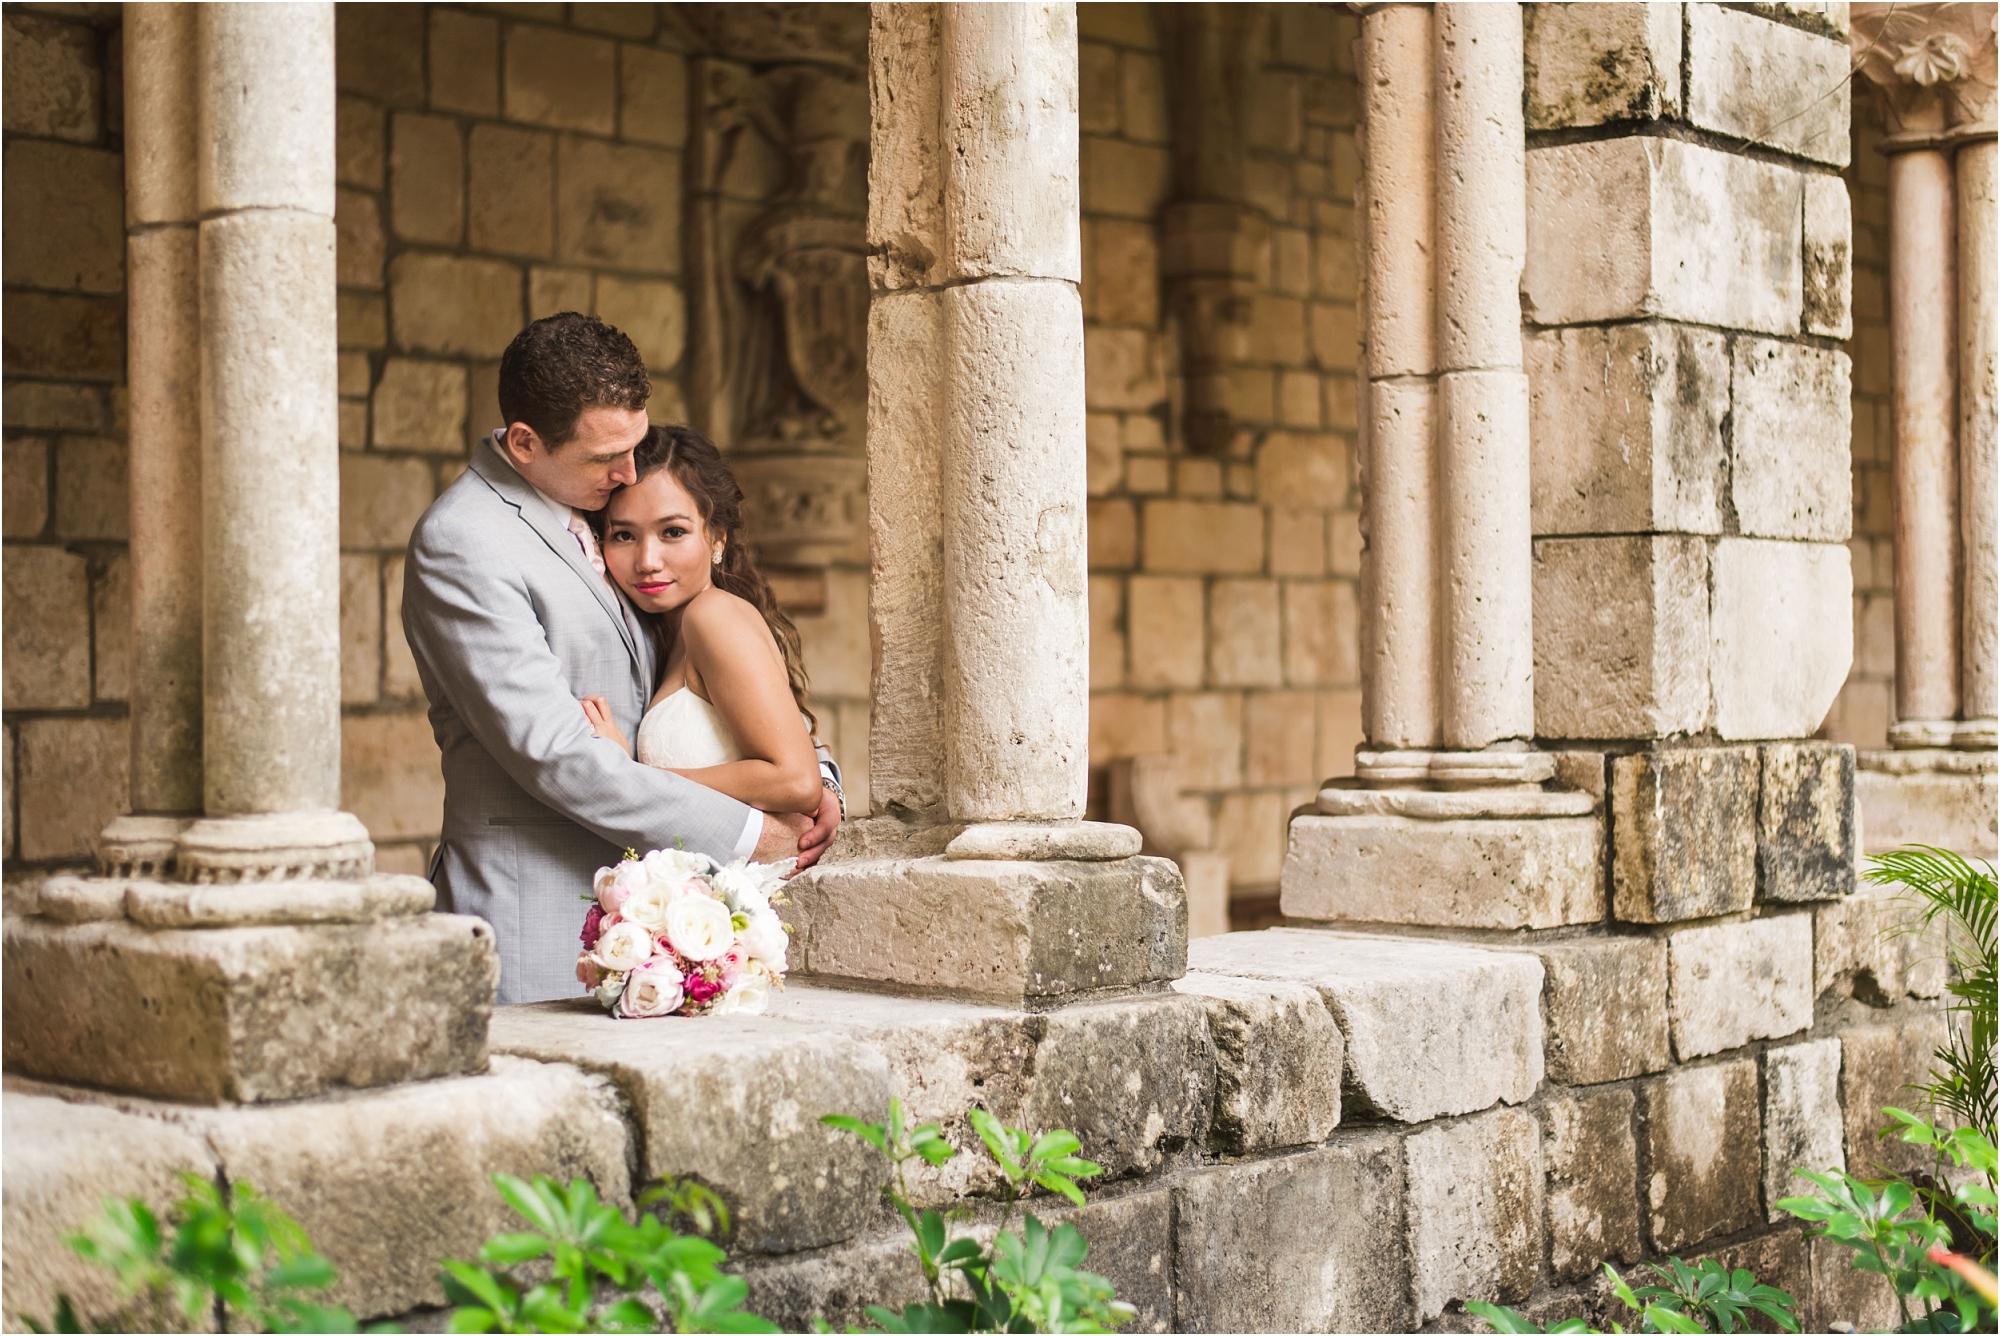 Spanish-Monastery-miami-beach-outdoor-elegant-wedding-photographer-jessenia-gonzalez_1208.jpg